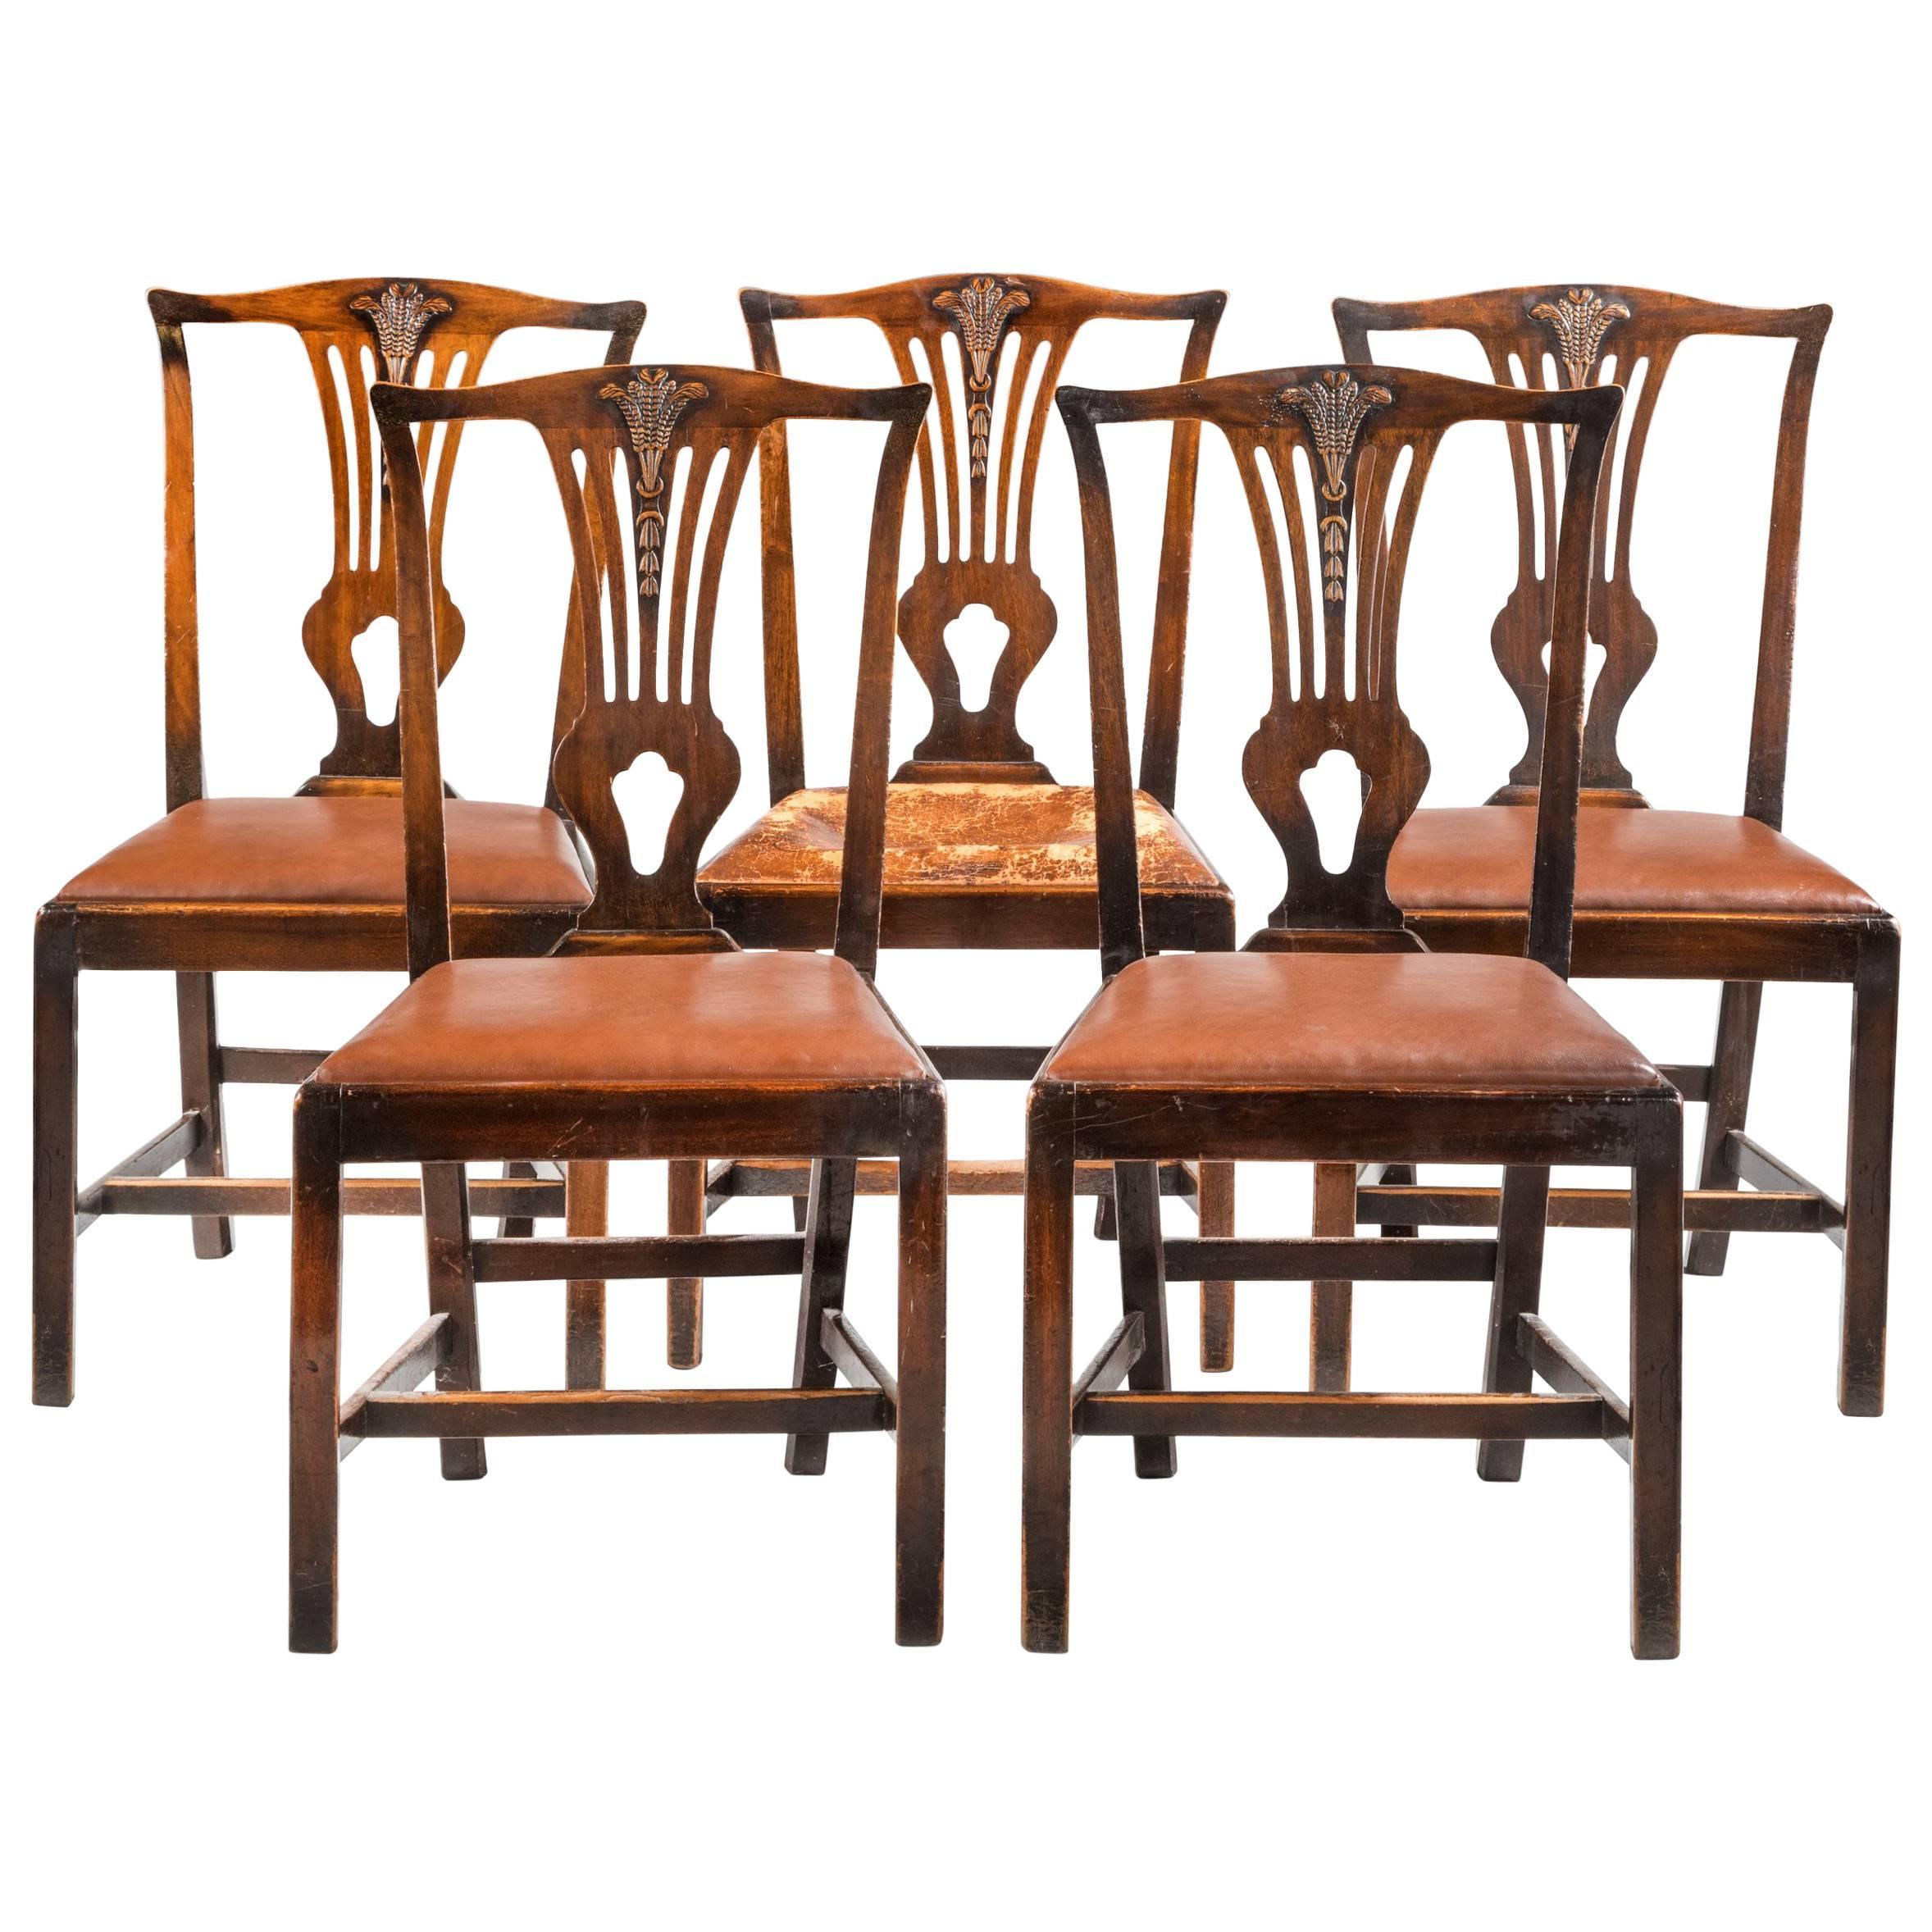 Set of Five George III Mahogany Dining Chairs